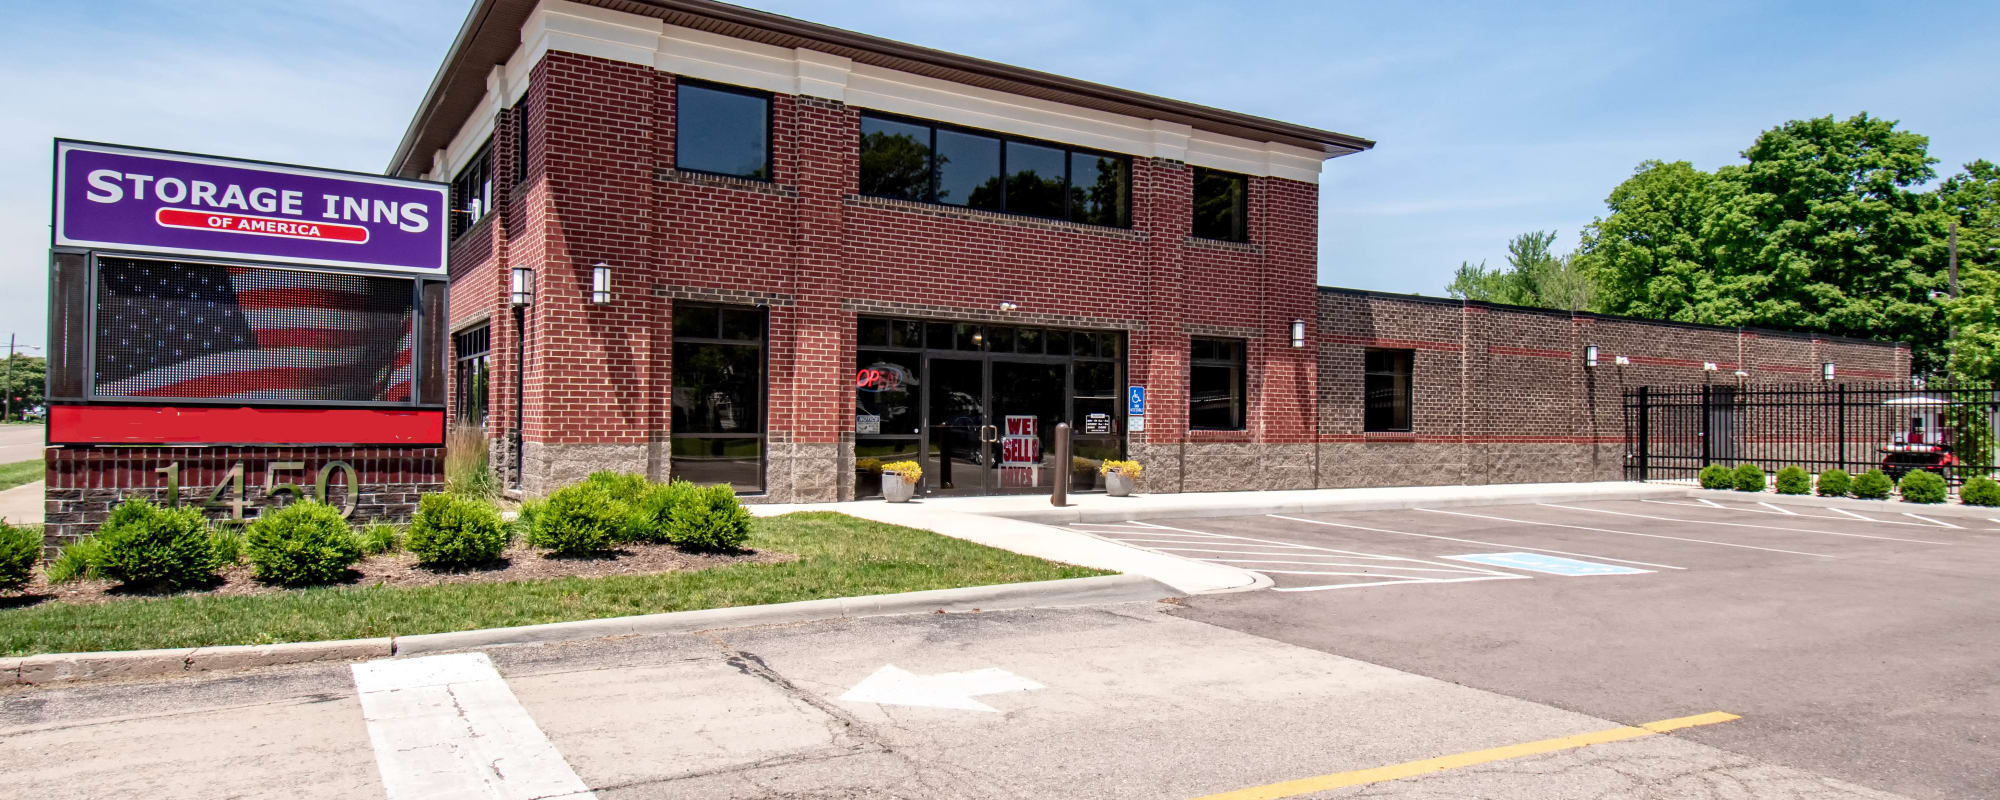 Storage Inns of America in Dayton Ohio